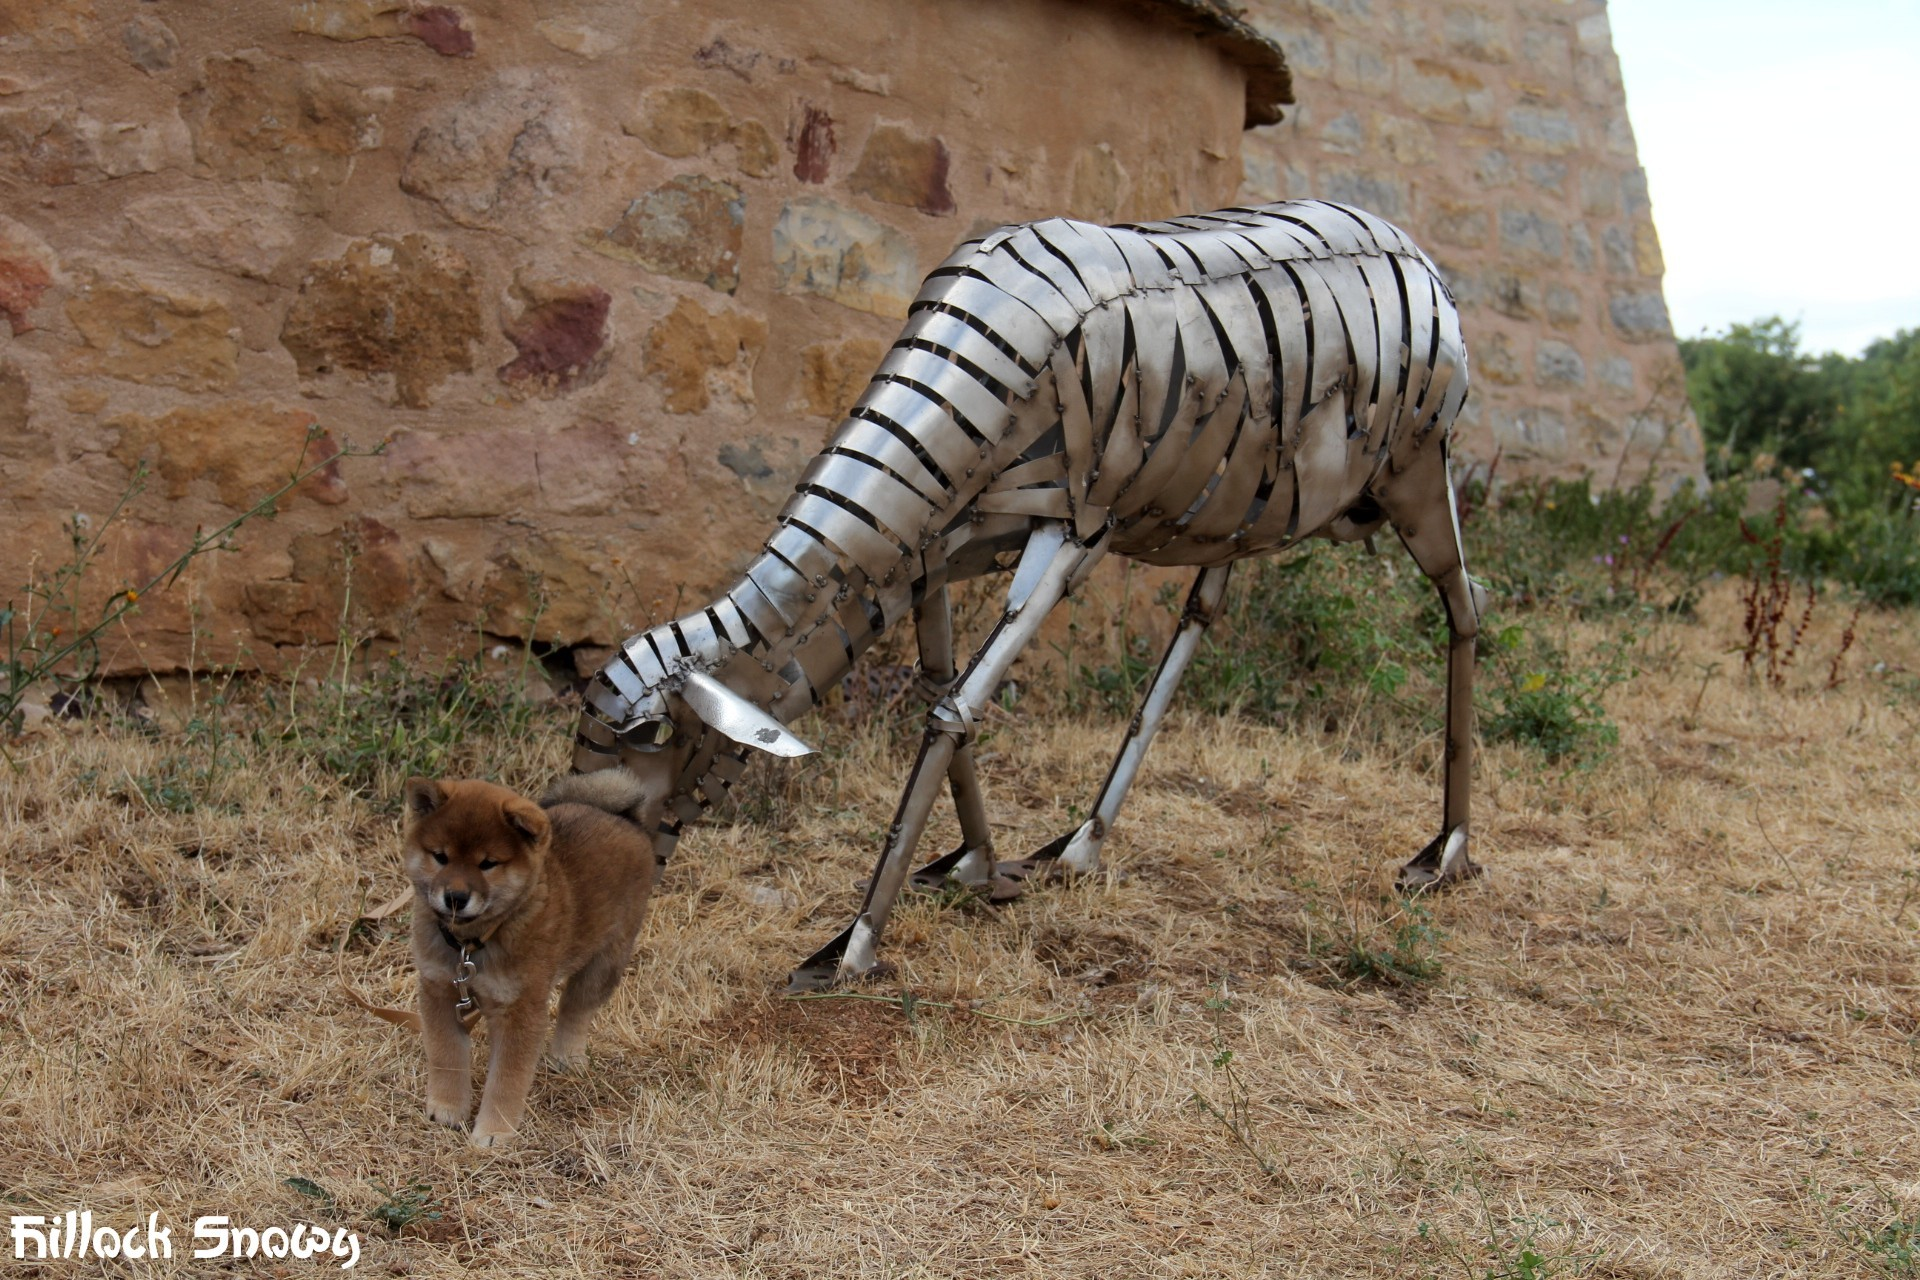 Attaque de chèvre roquefort